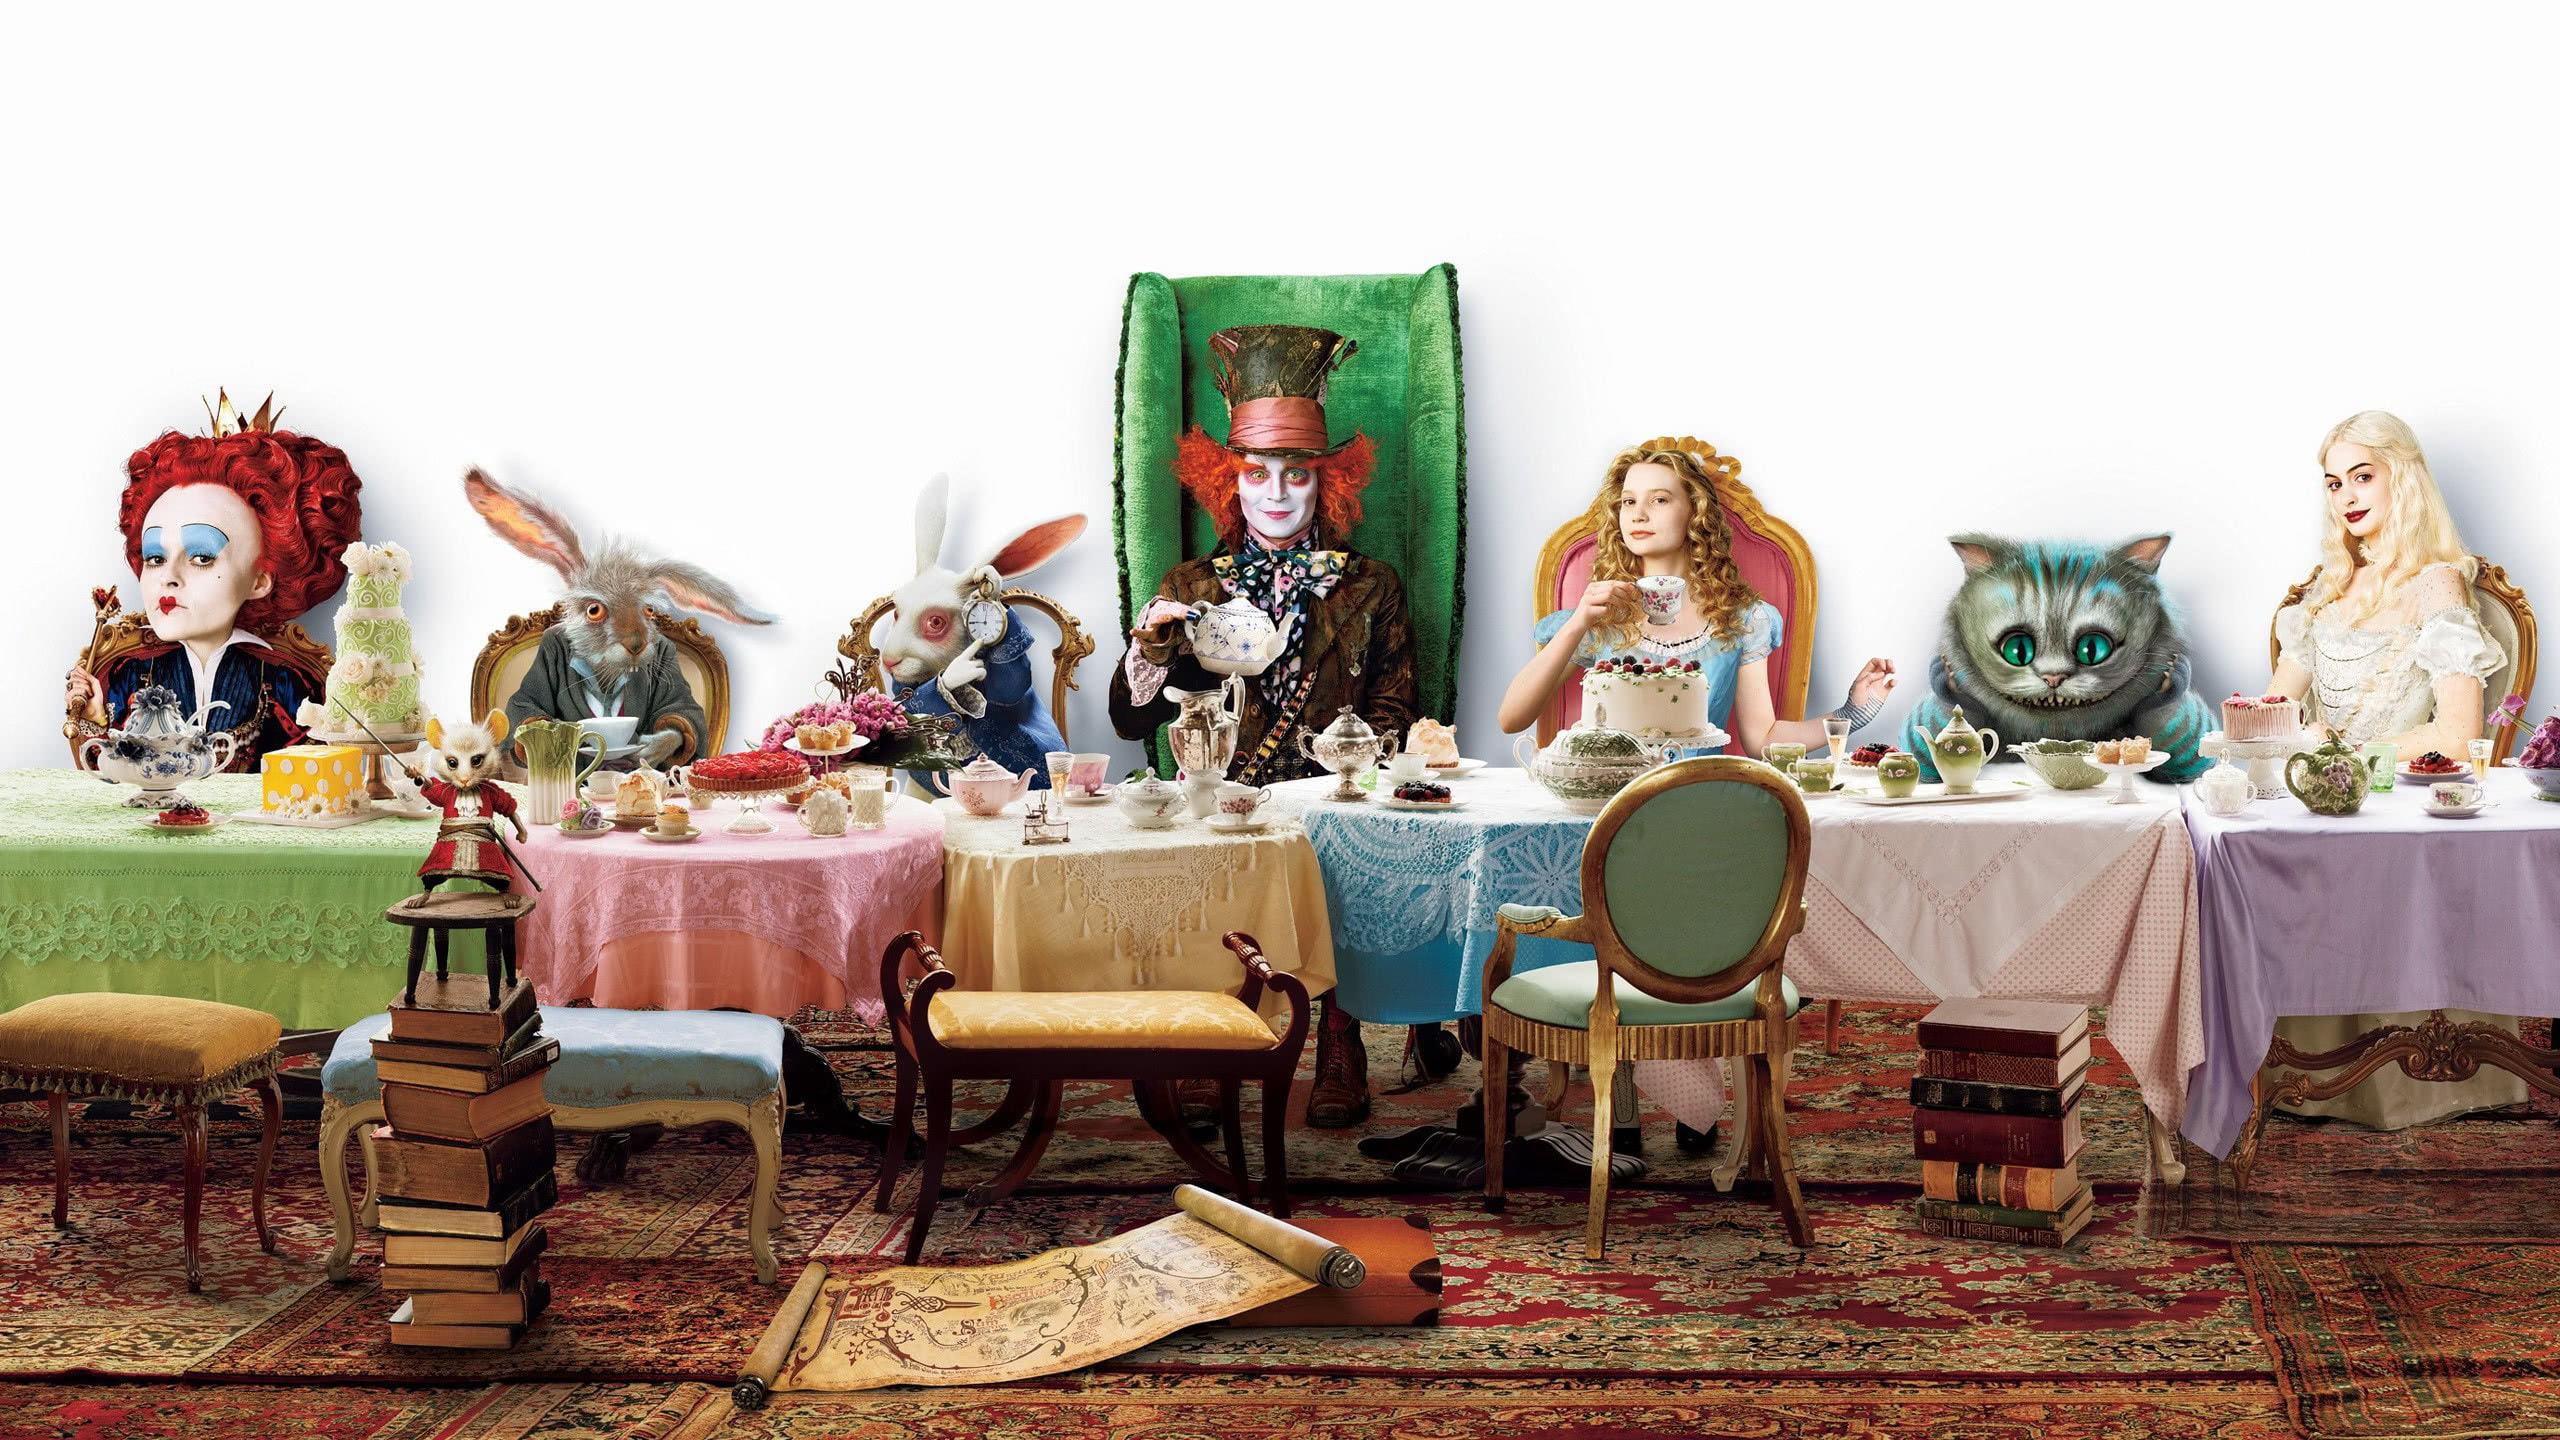 alice adventures in wonderland tea party table wqhd 1440p wallpaper